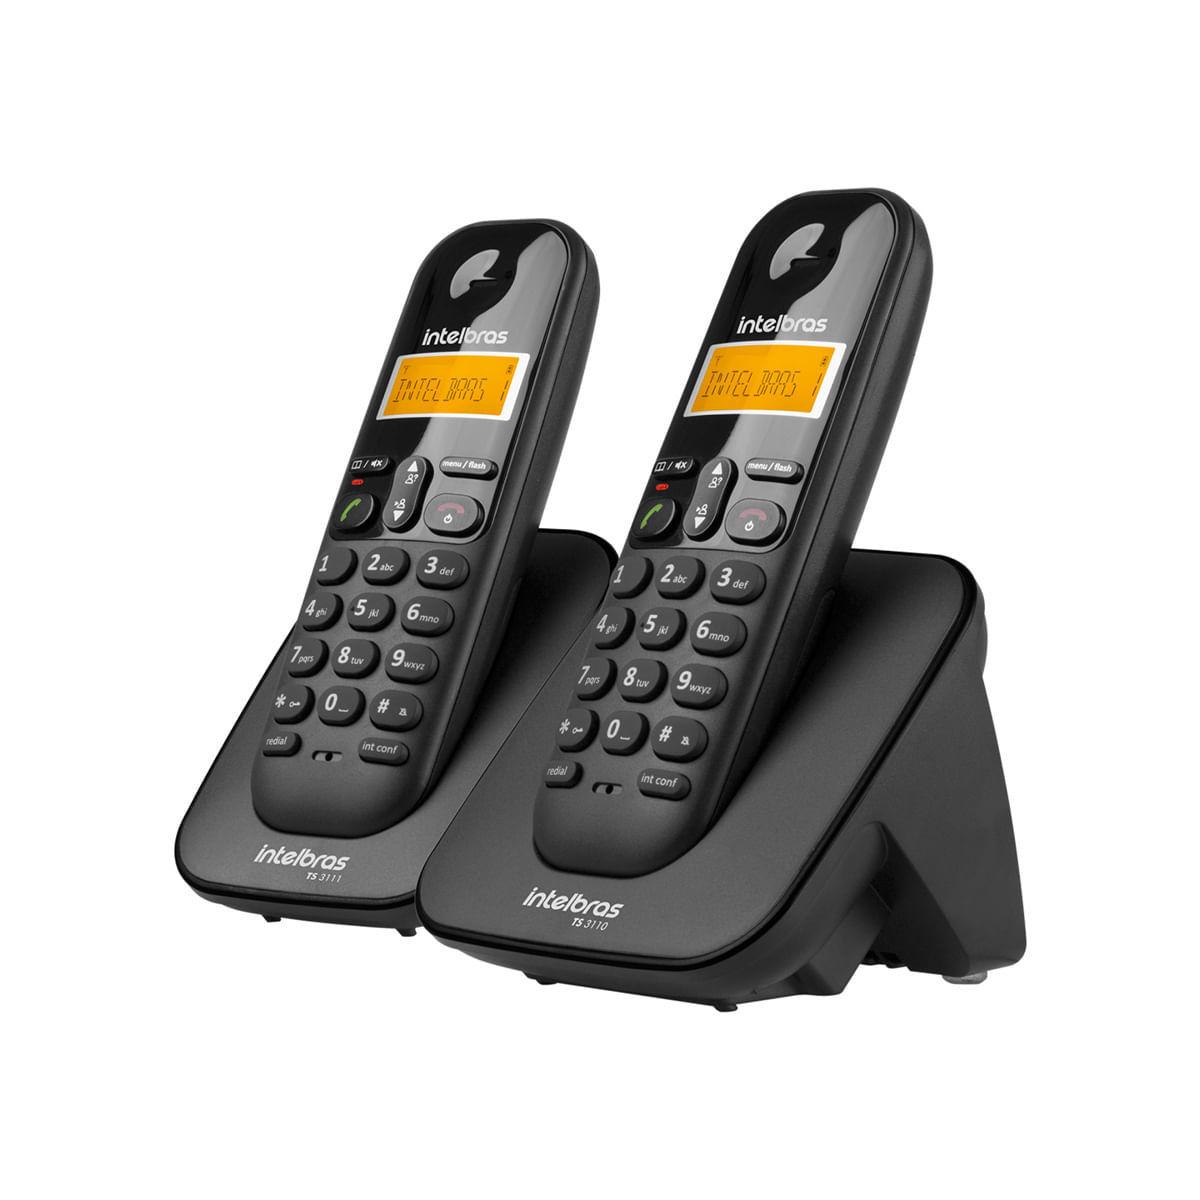 Kit Telefone sem Fio Digital + Ramal Intelbras TS 3112 Preto